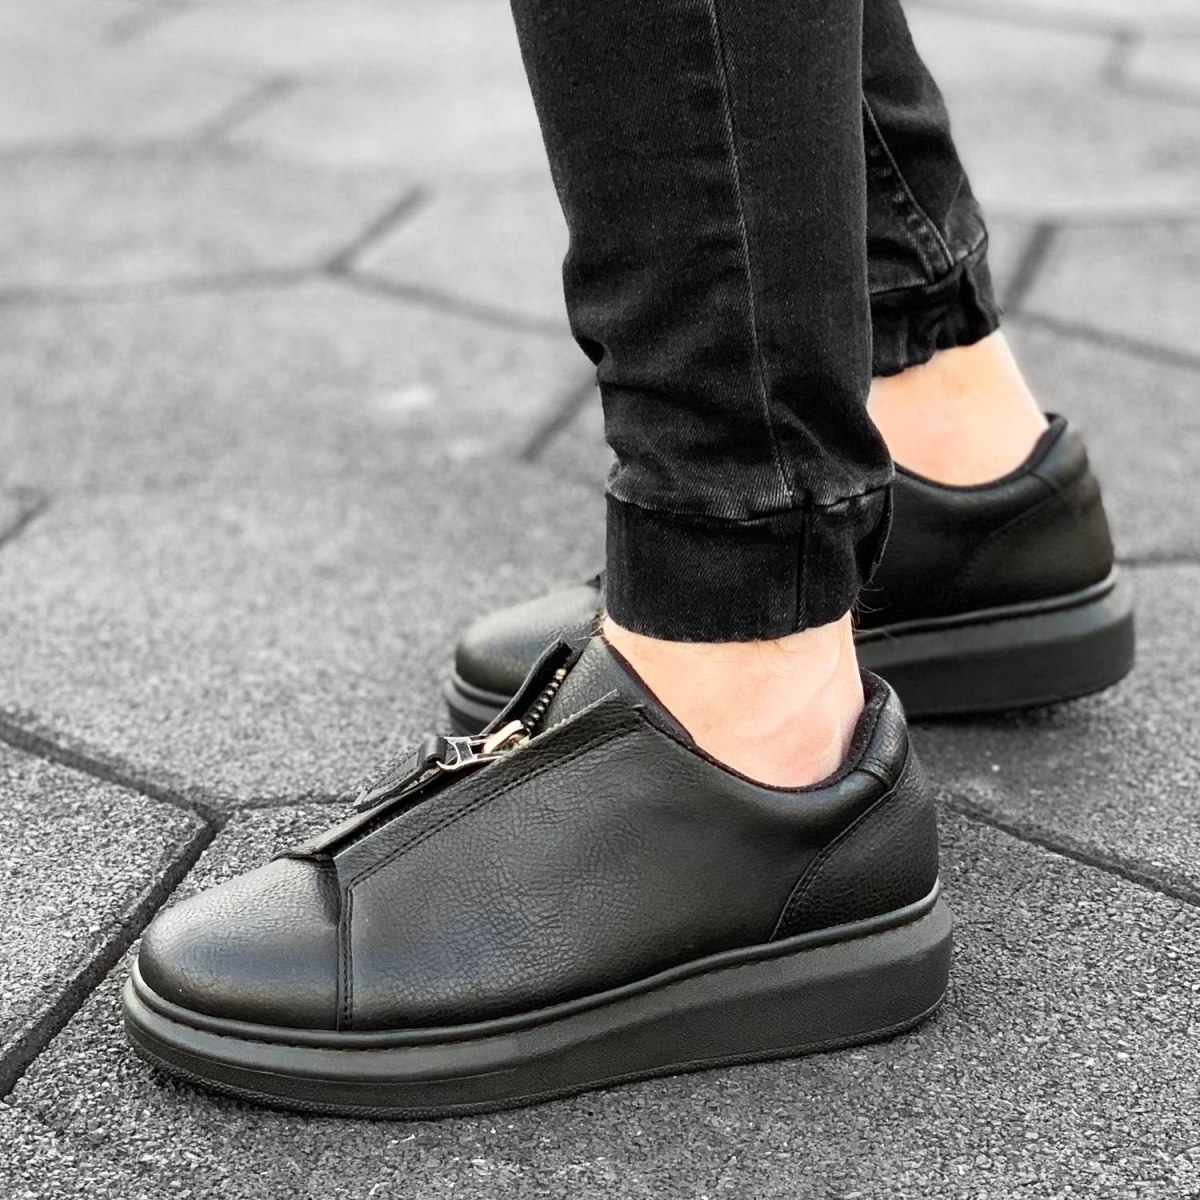 Zip-Up Sneakers in Black